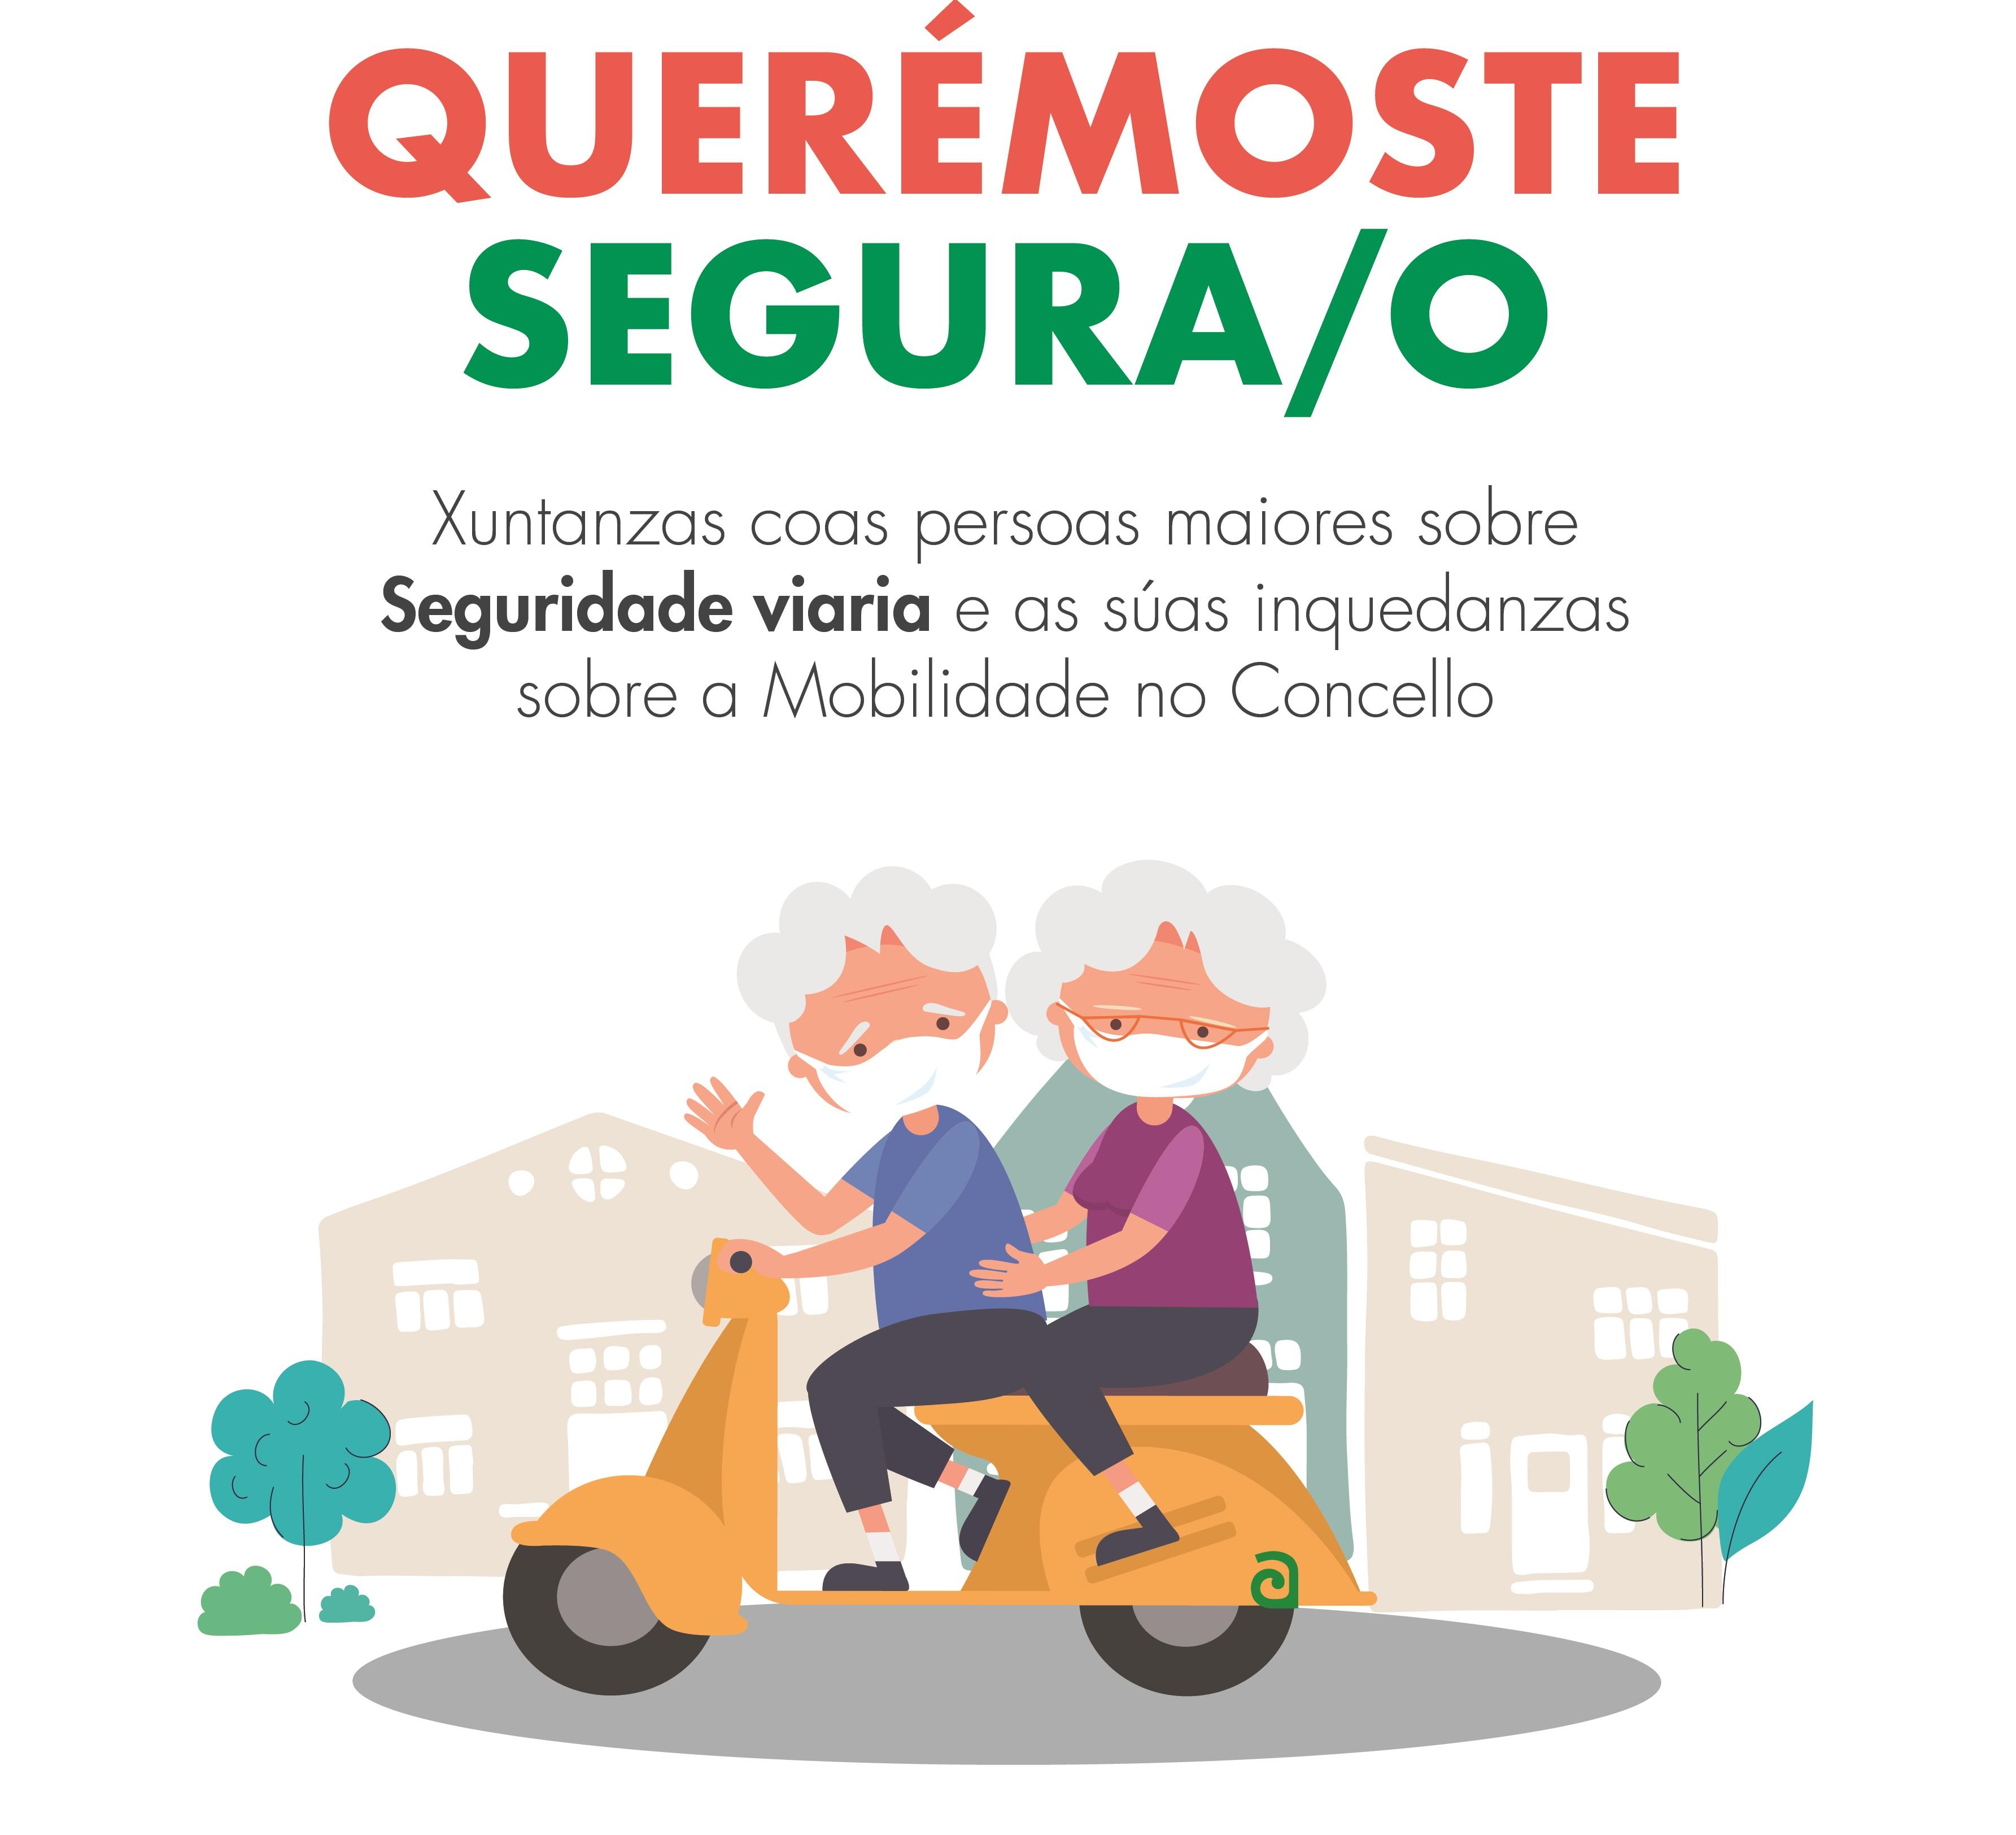 Cartel informativo da charla Querémoste segura/o.